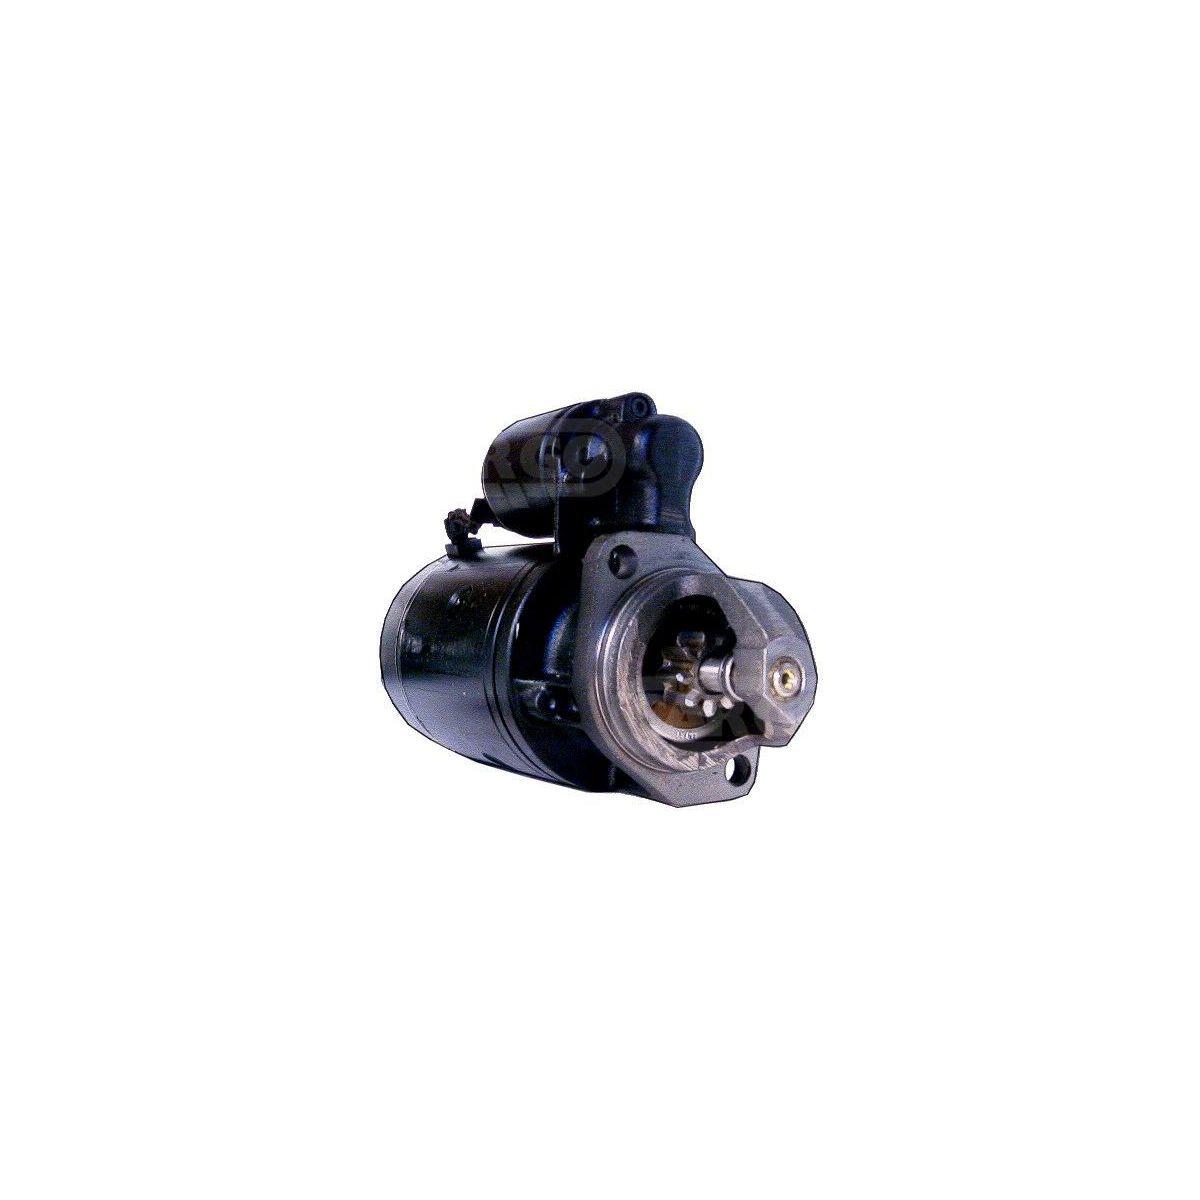 Motorino avviamento BOSCH compatibile 12V  1,9KW SABB DIESEL, SALANZI DVA DIESEL 0001366014